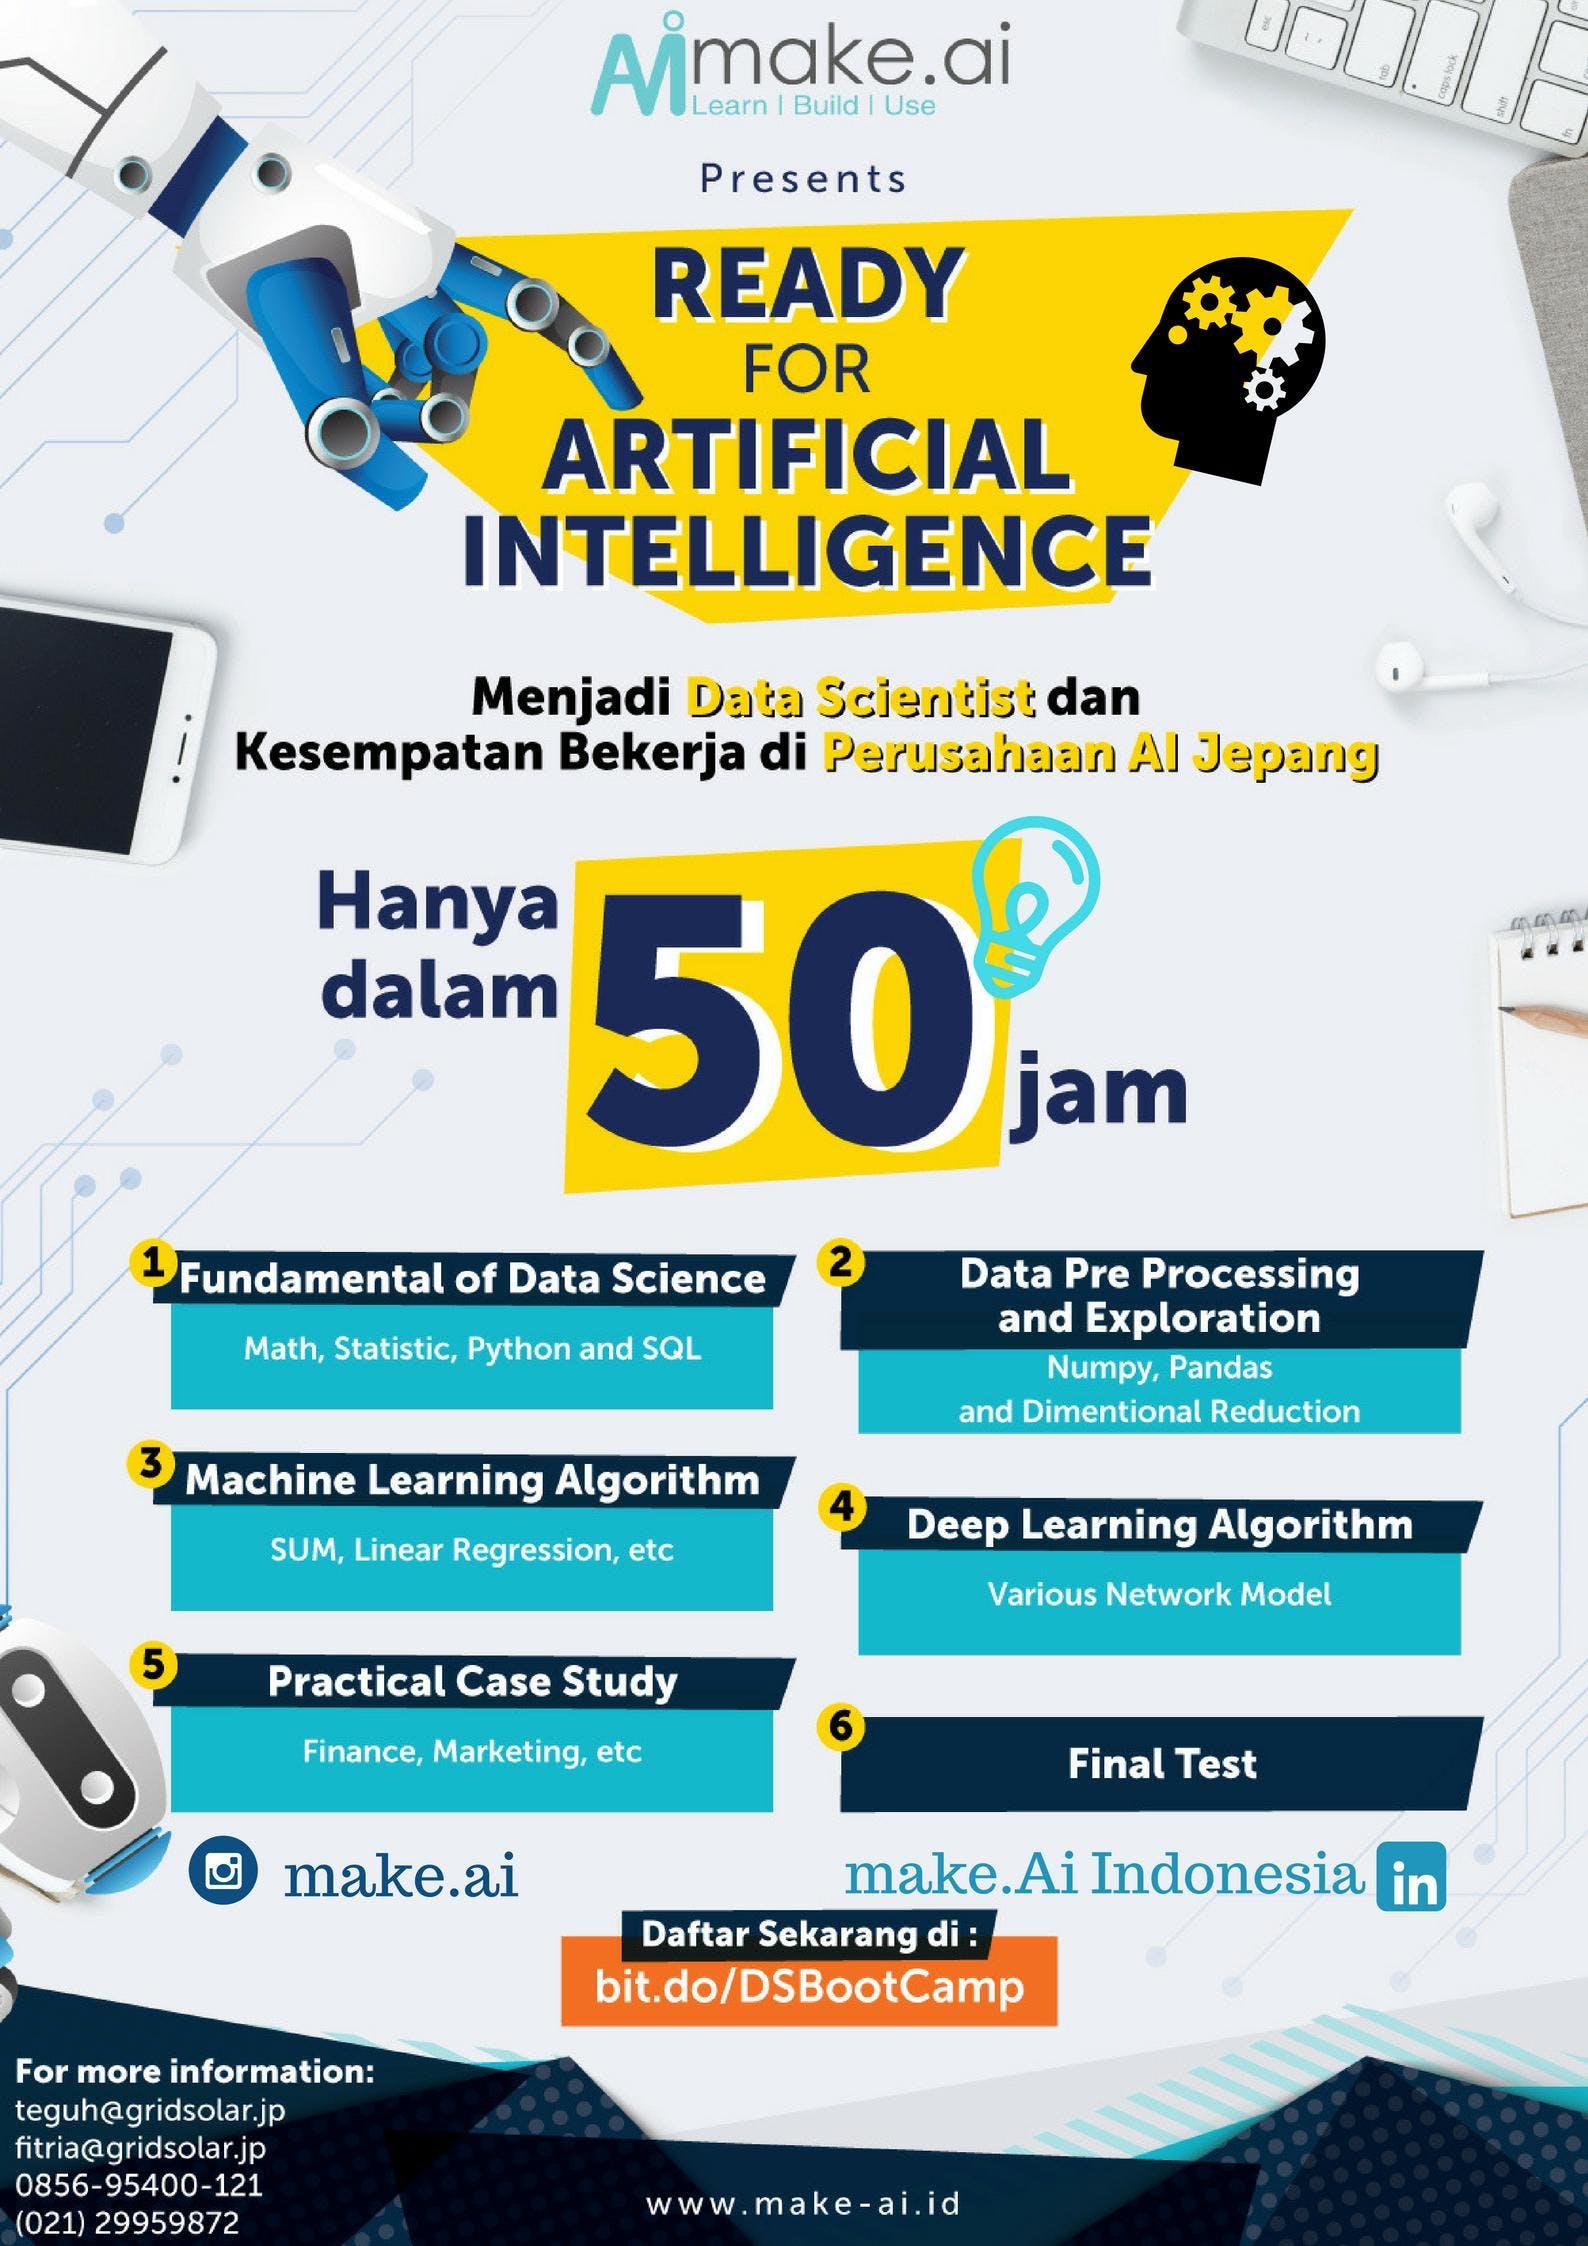 [Paid Bootcamp] - Make.AI Data Science Bootcamp Batch.4